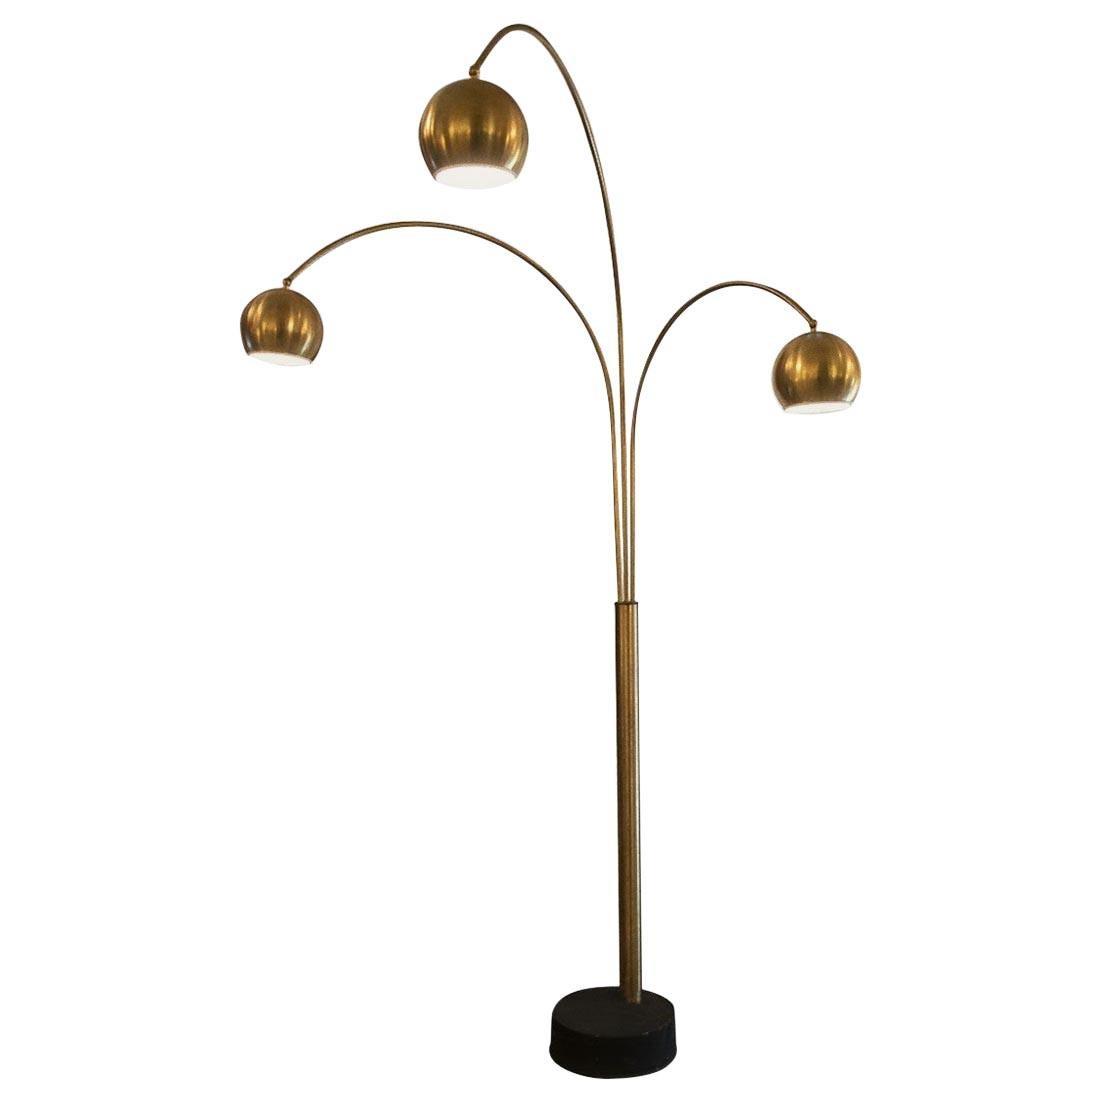 Vintage Floor Lamp by Goffredo Reggiani, 1970s